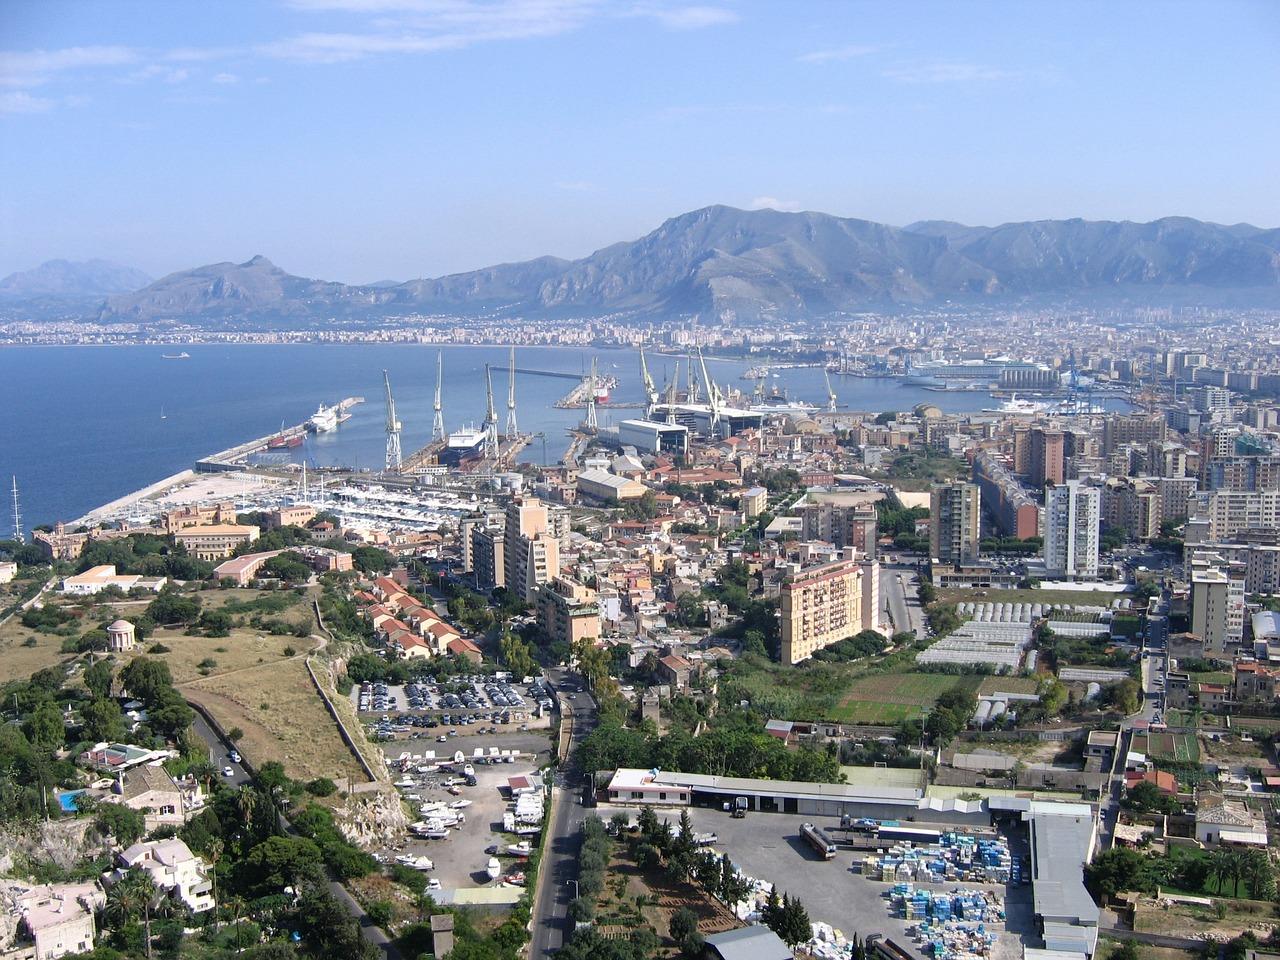 birds eye view of Palermo in Sicily